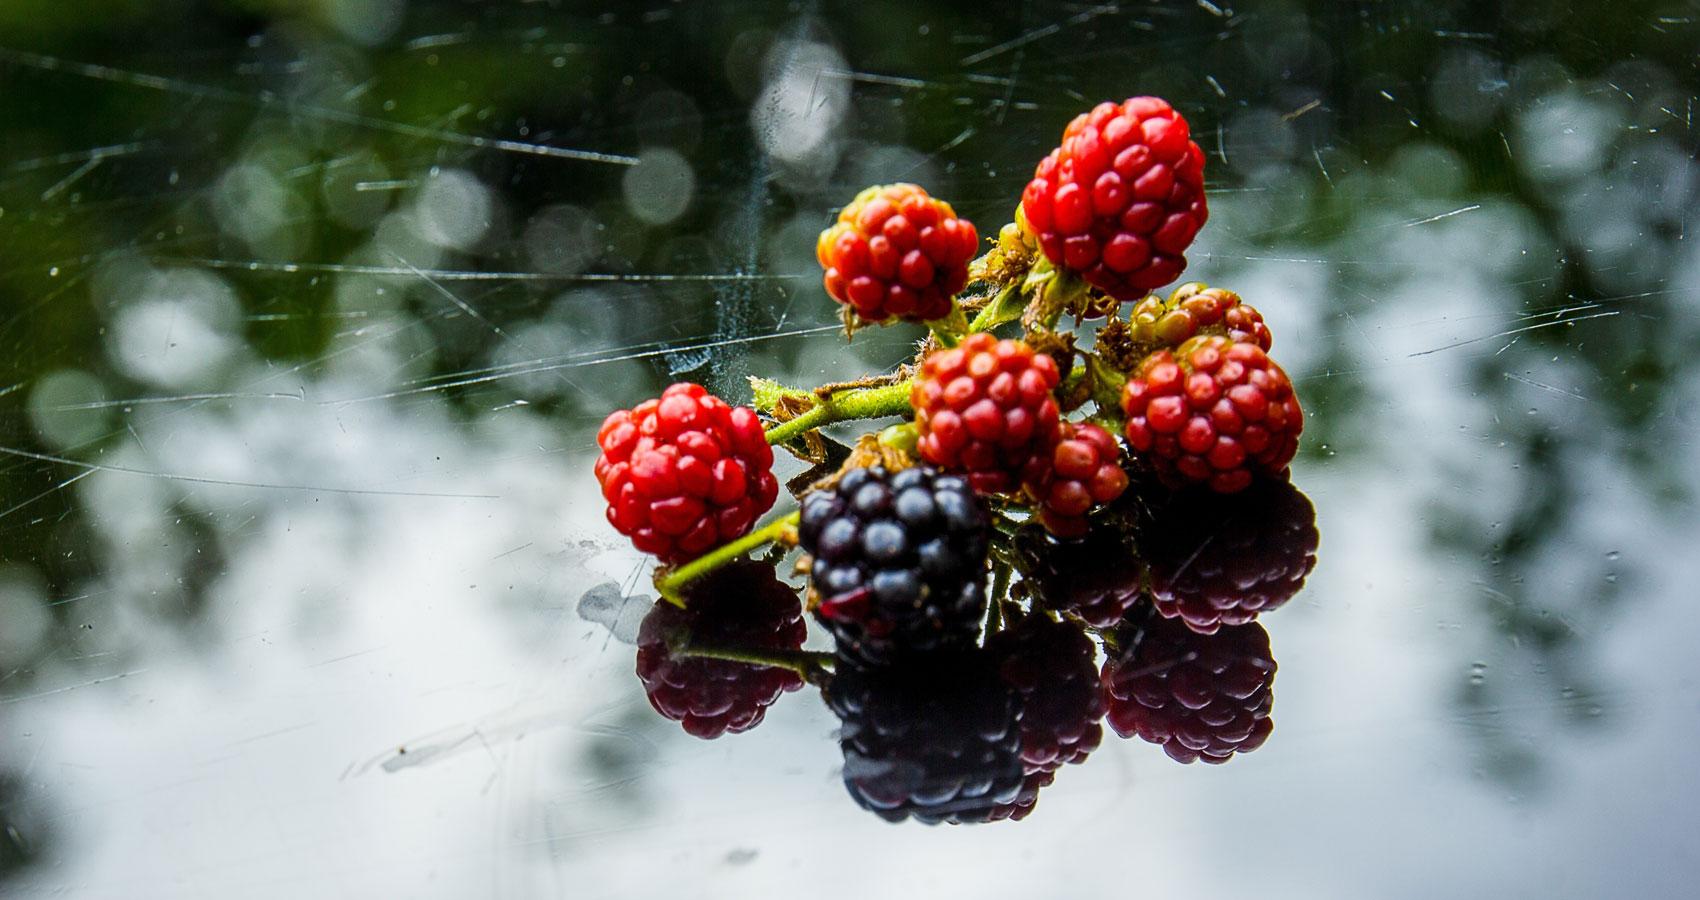 Blackberry-Picking by Seamus Heaneyat Spillwords.com